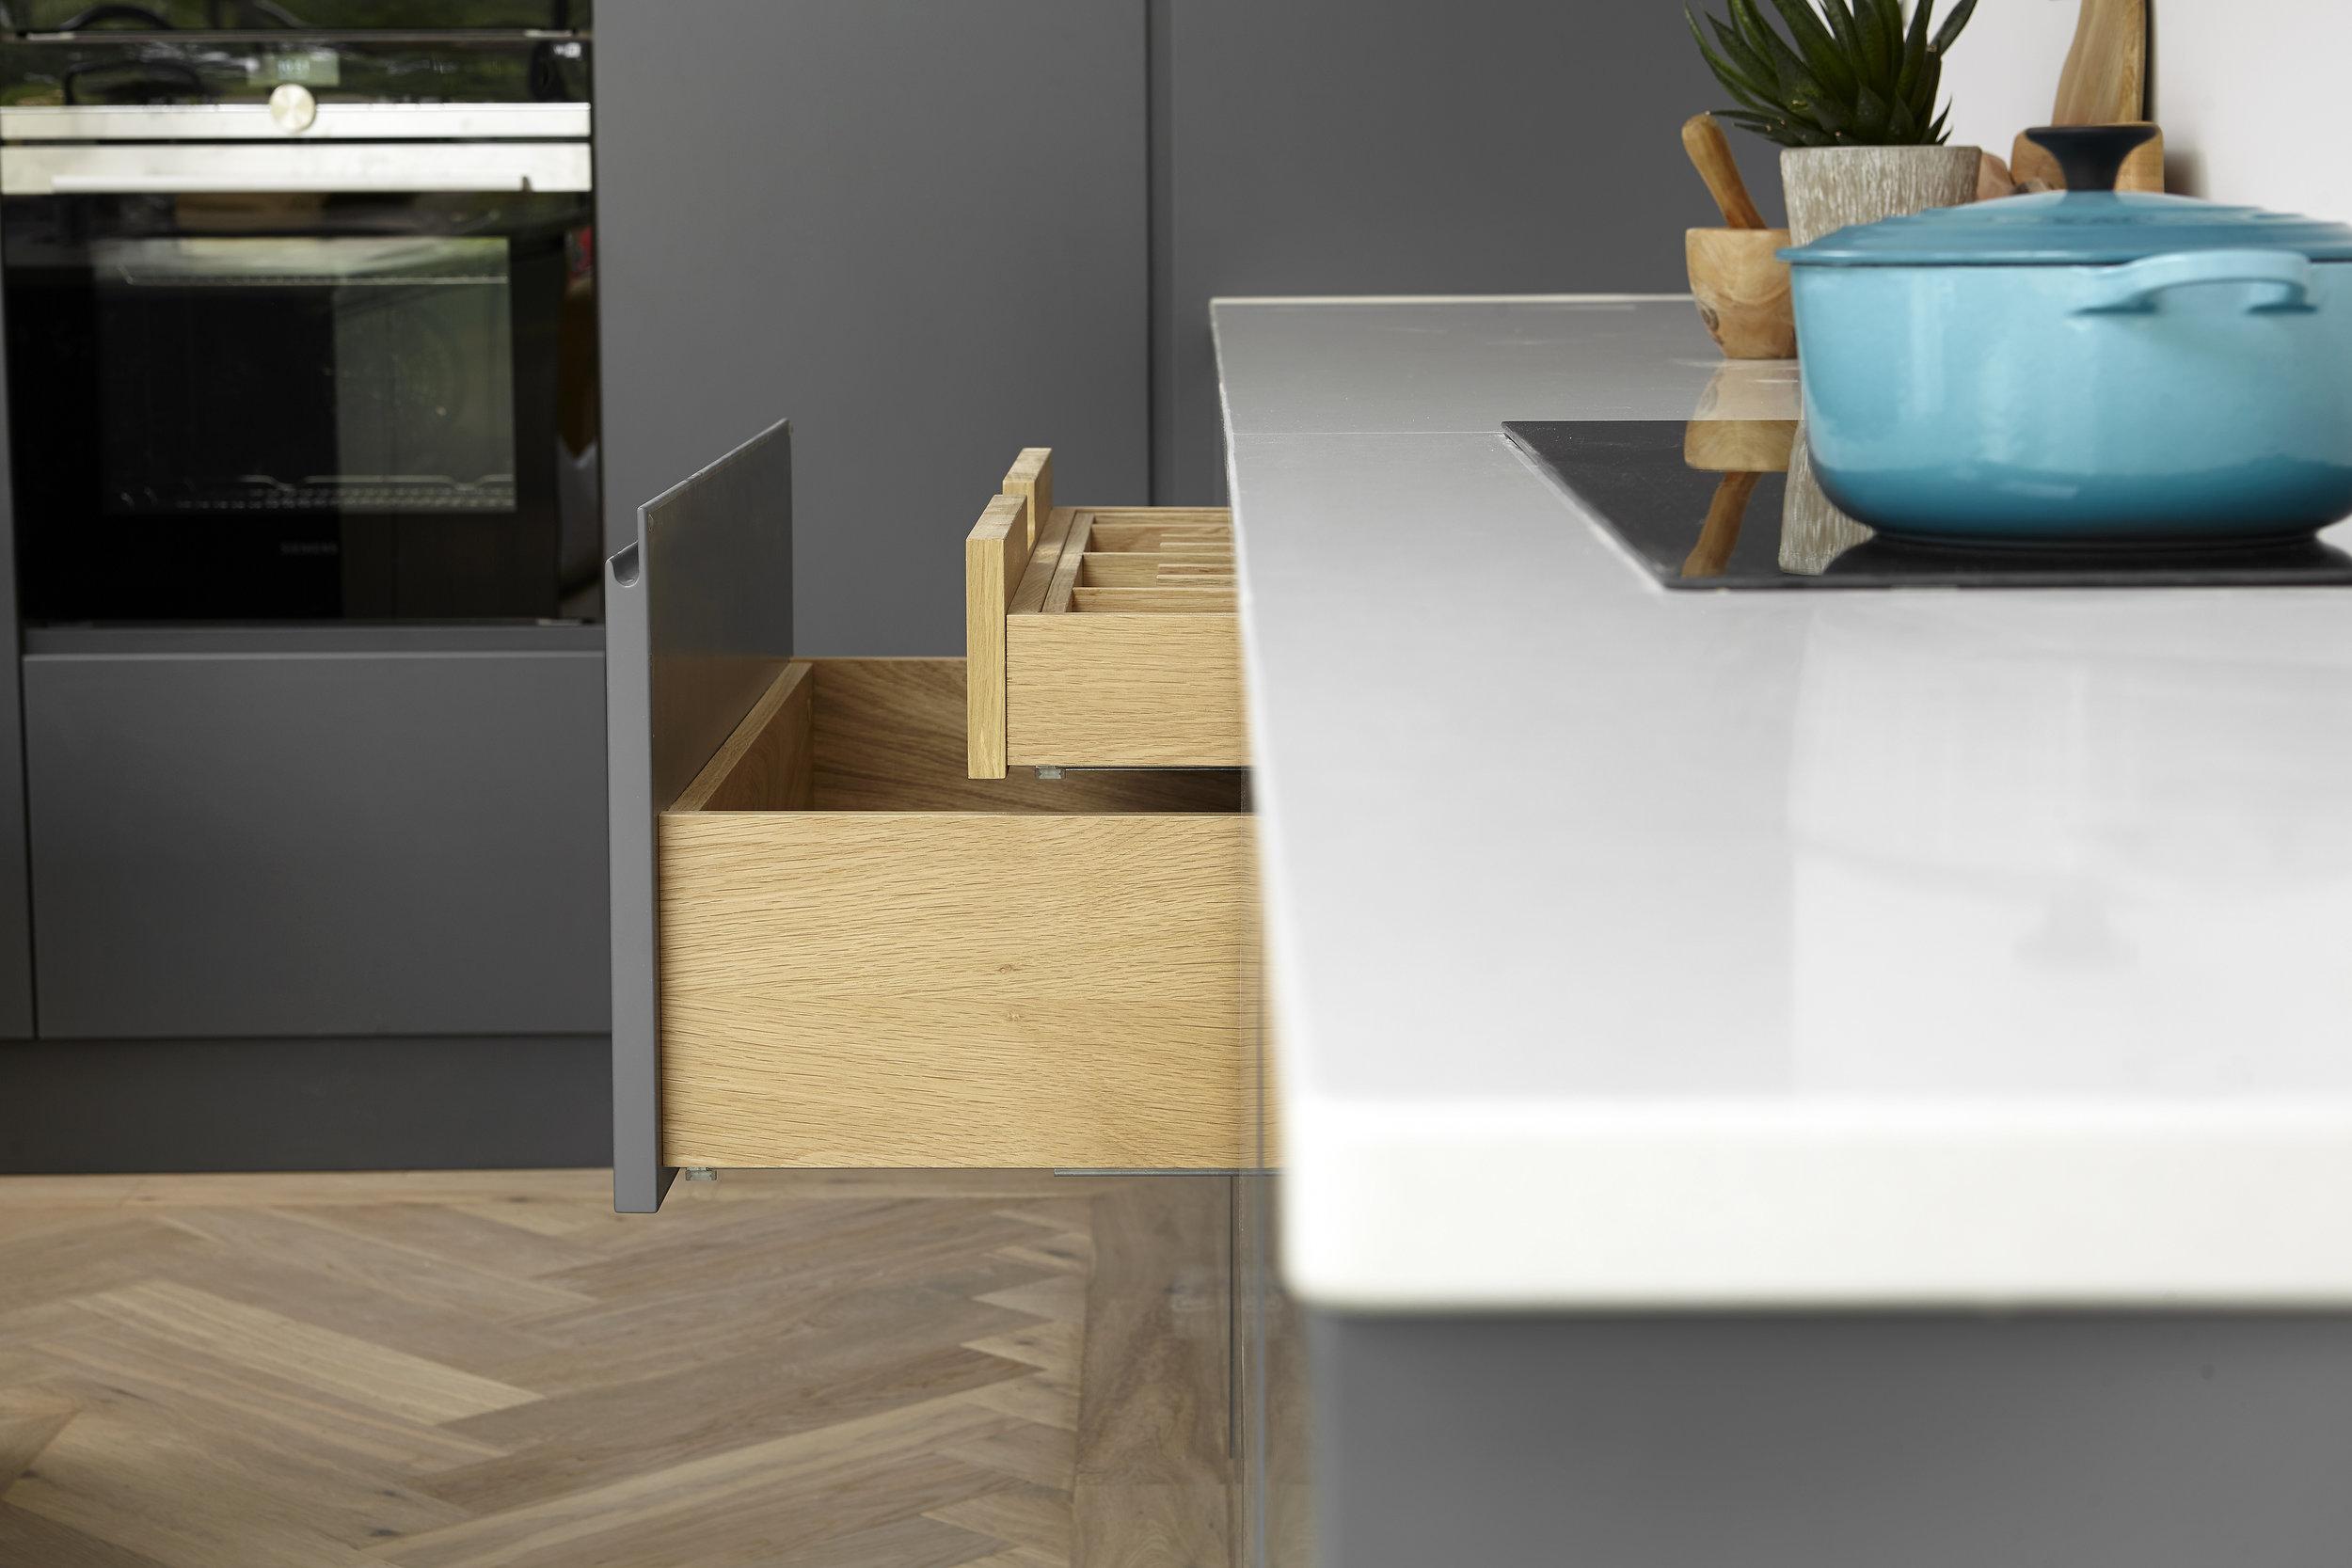 kitchens1236.jpg